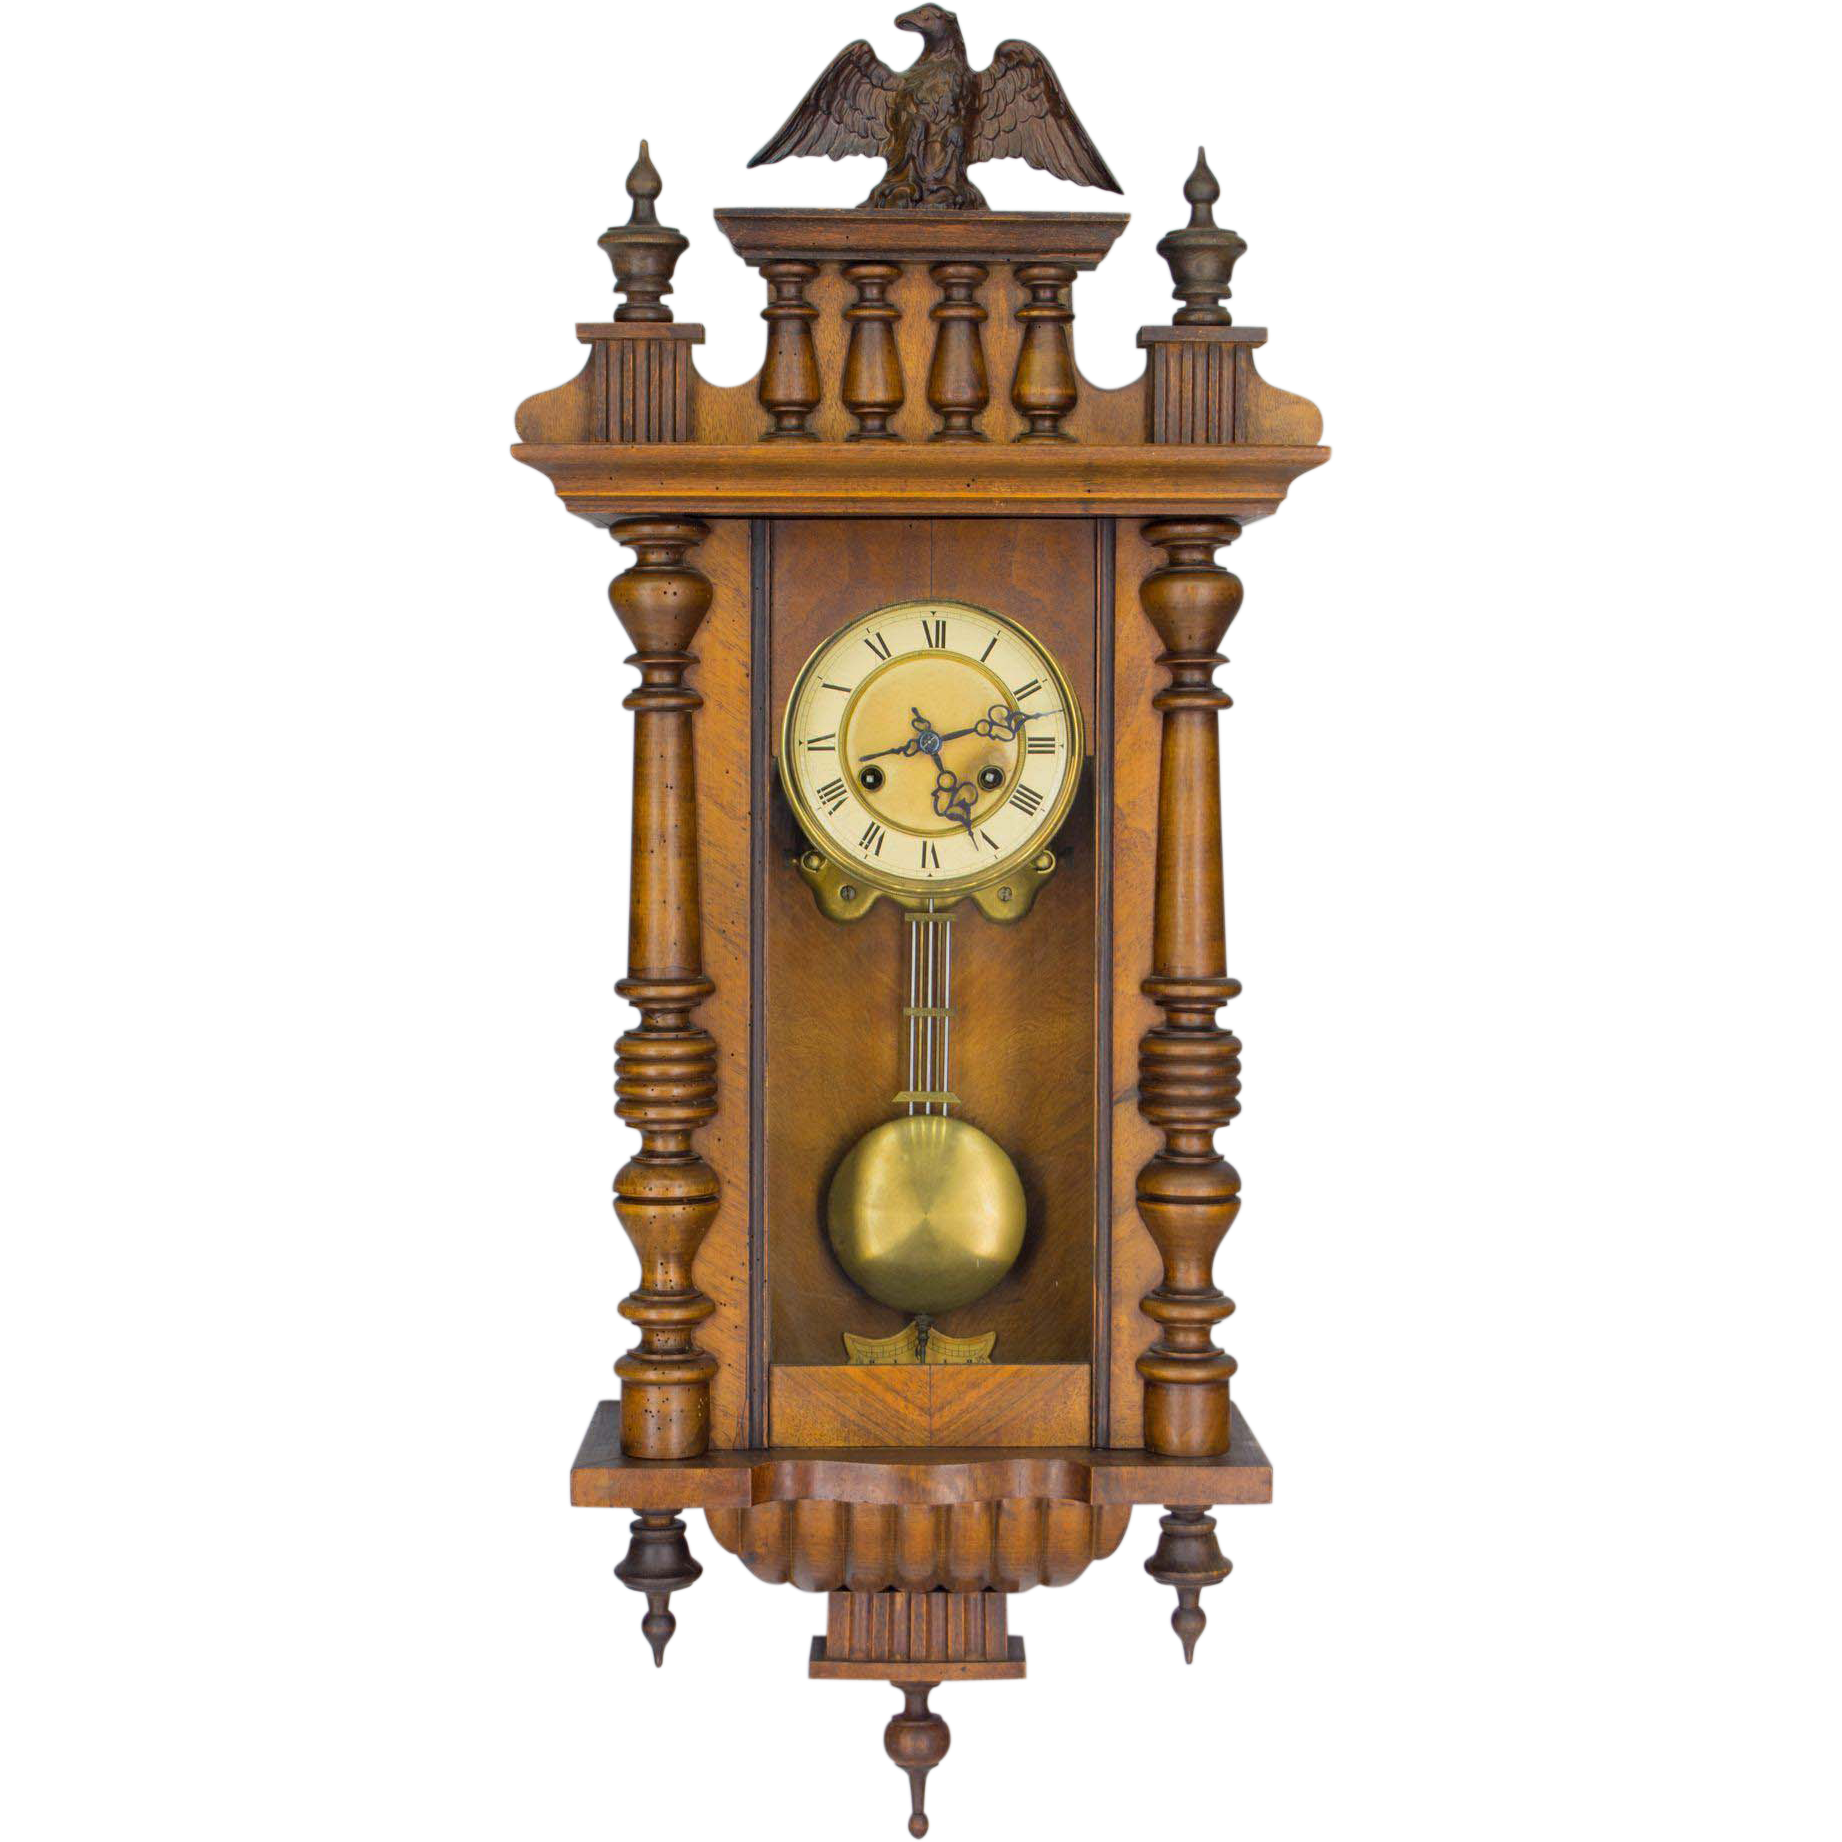 Swiss Regulator or Wall Clock